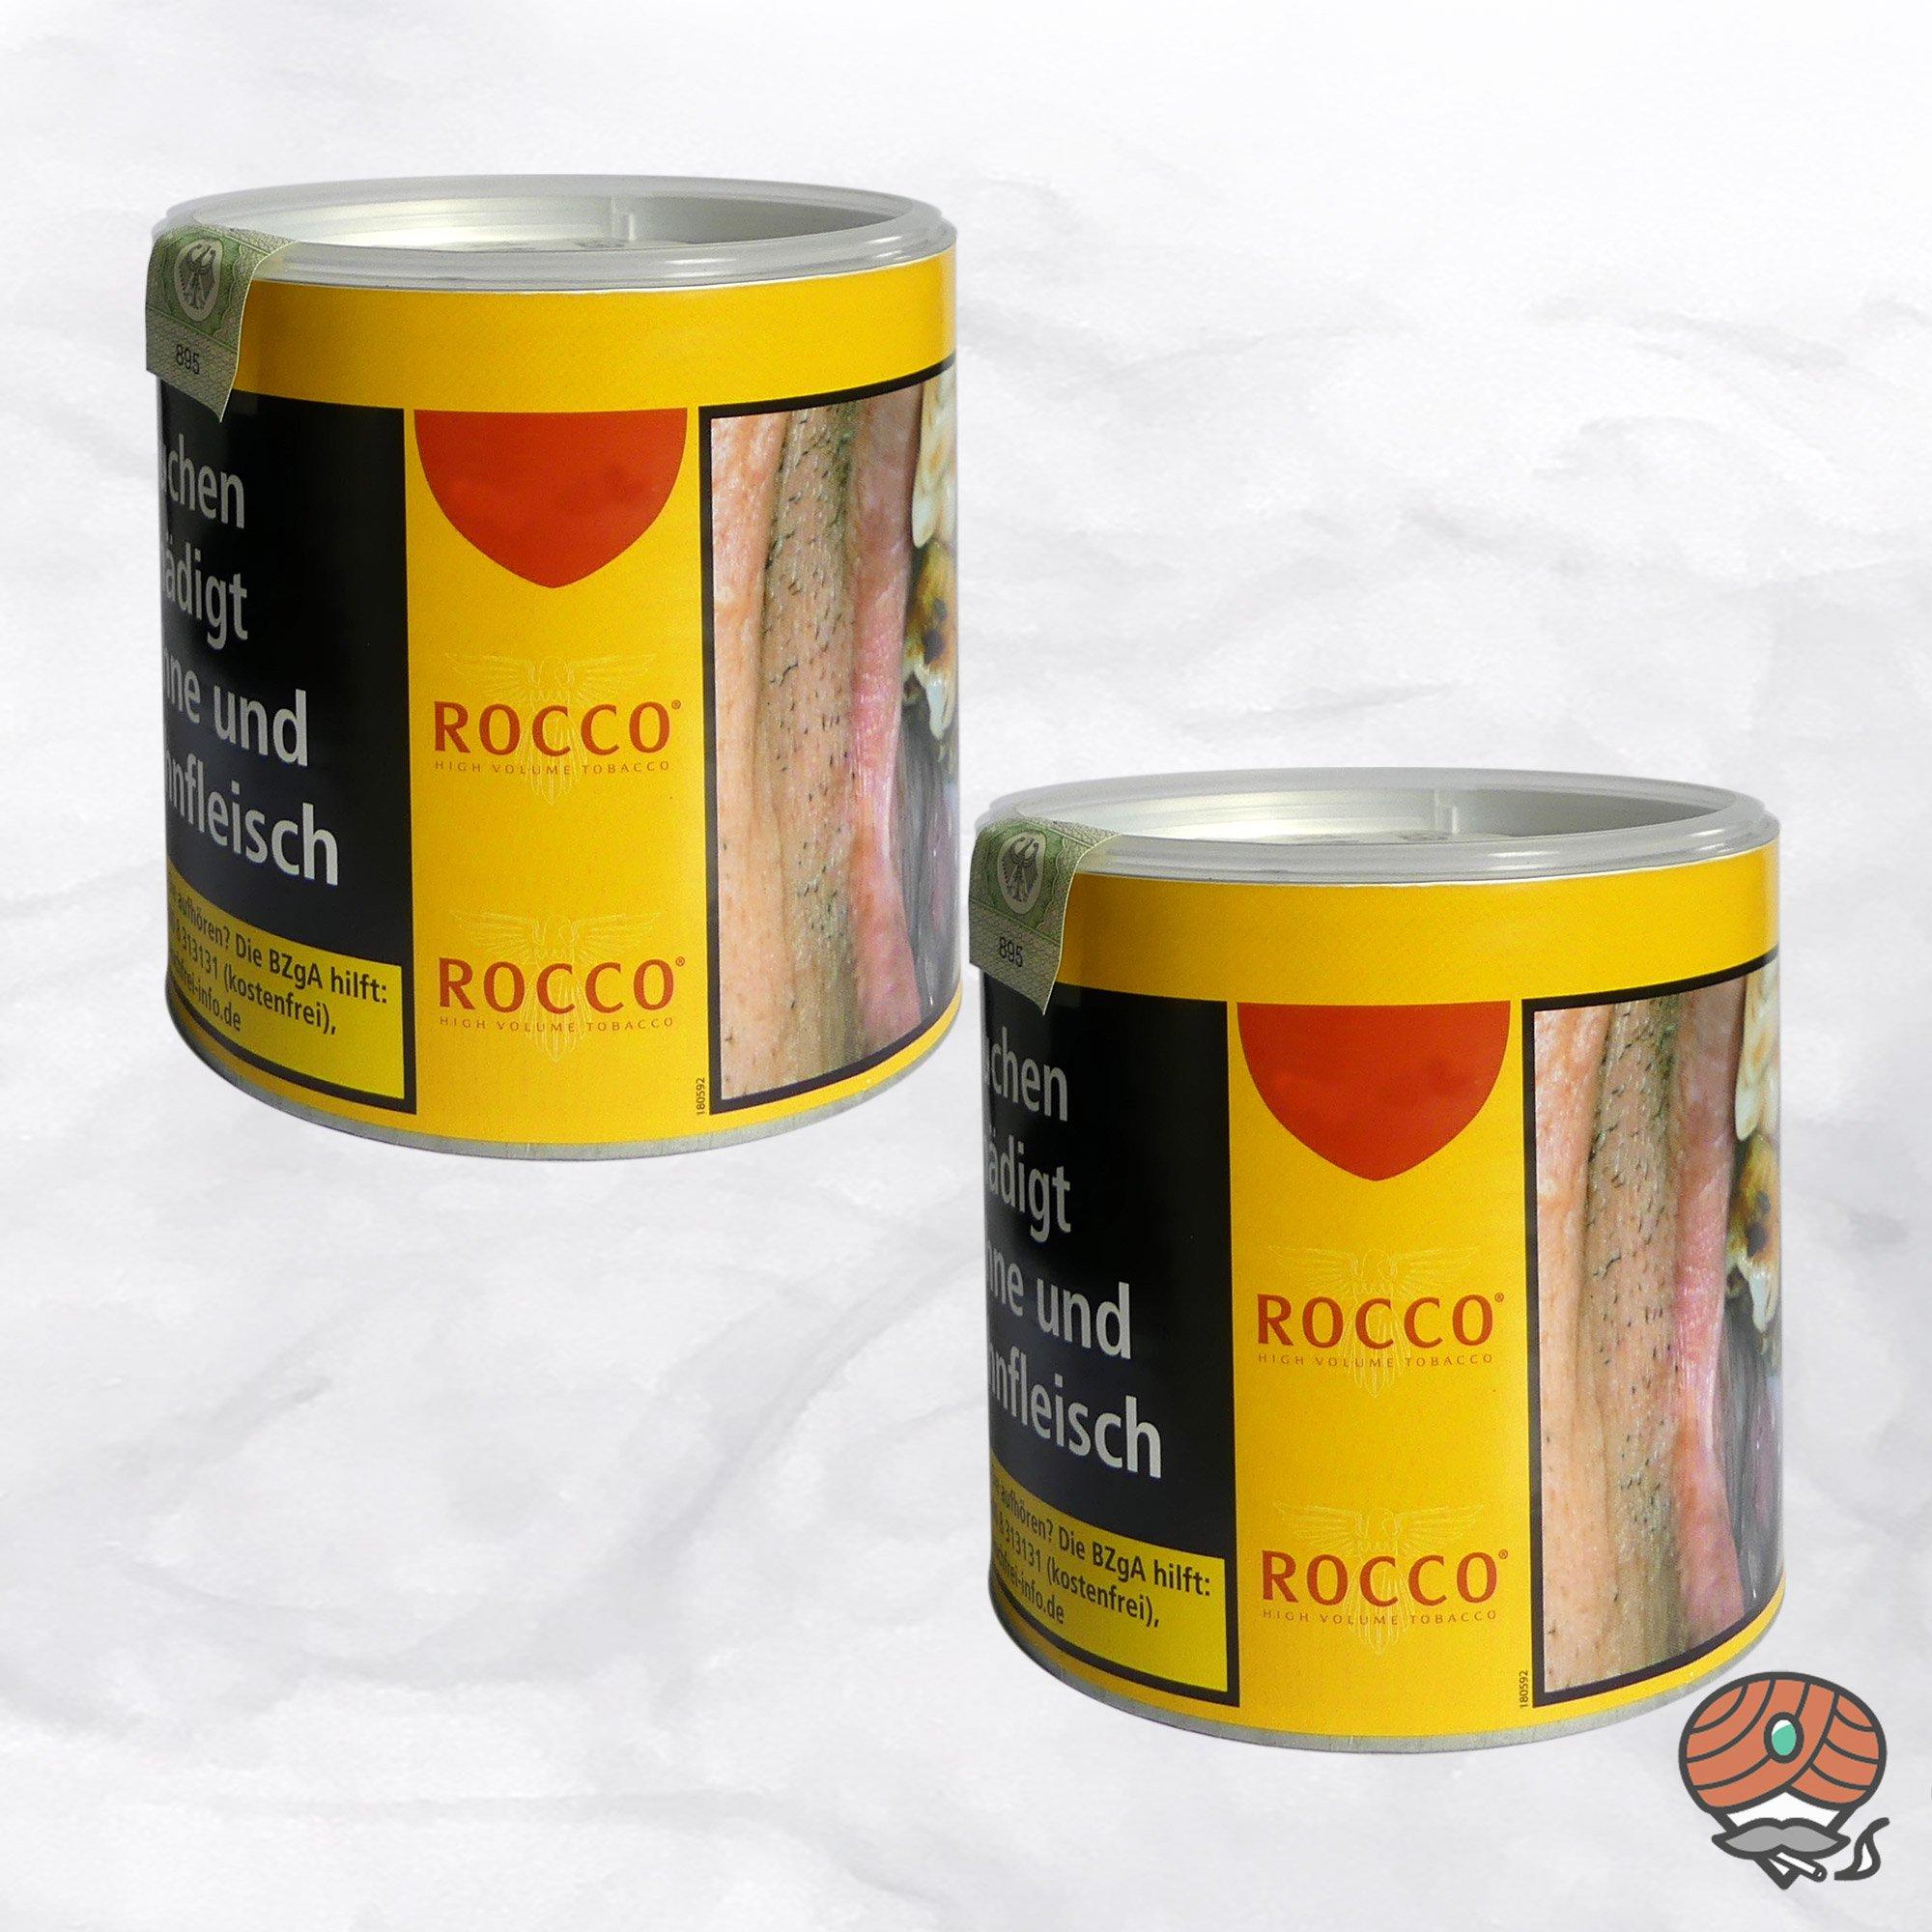 2 x ROCCO Tabak / Volumentabak Gelb Dose 35 g